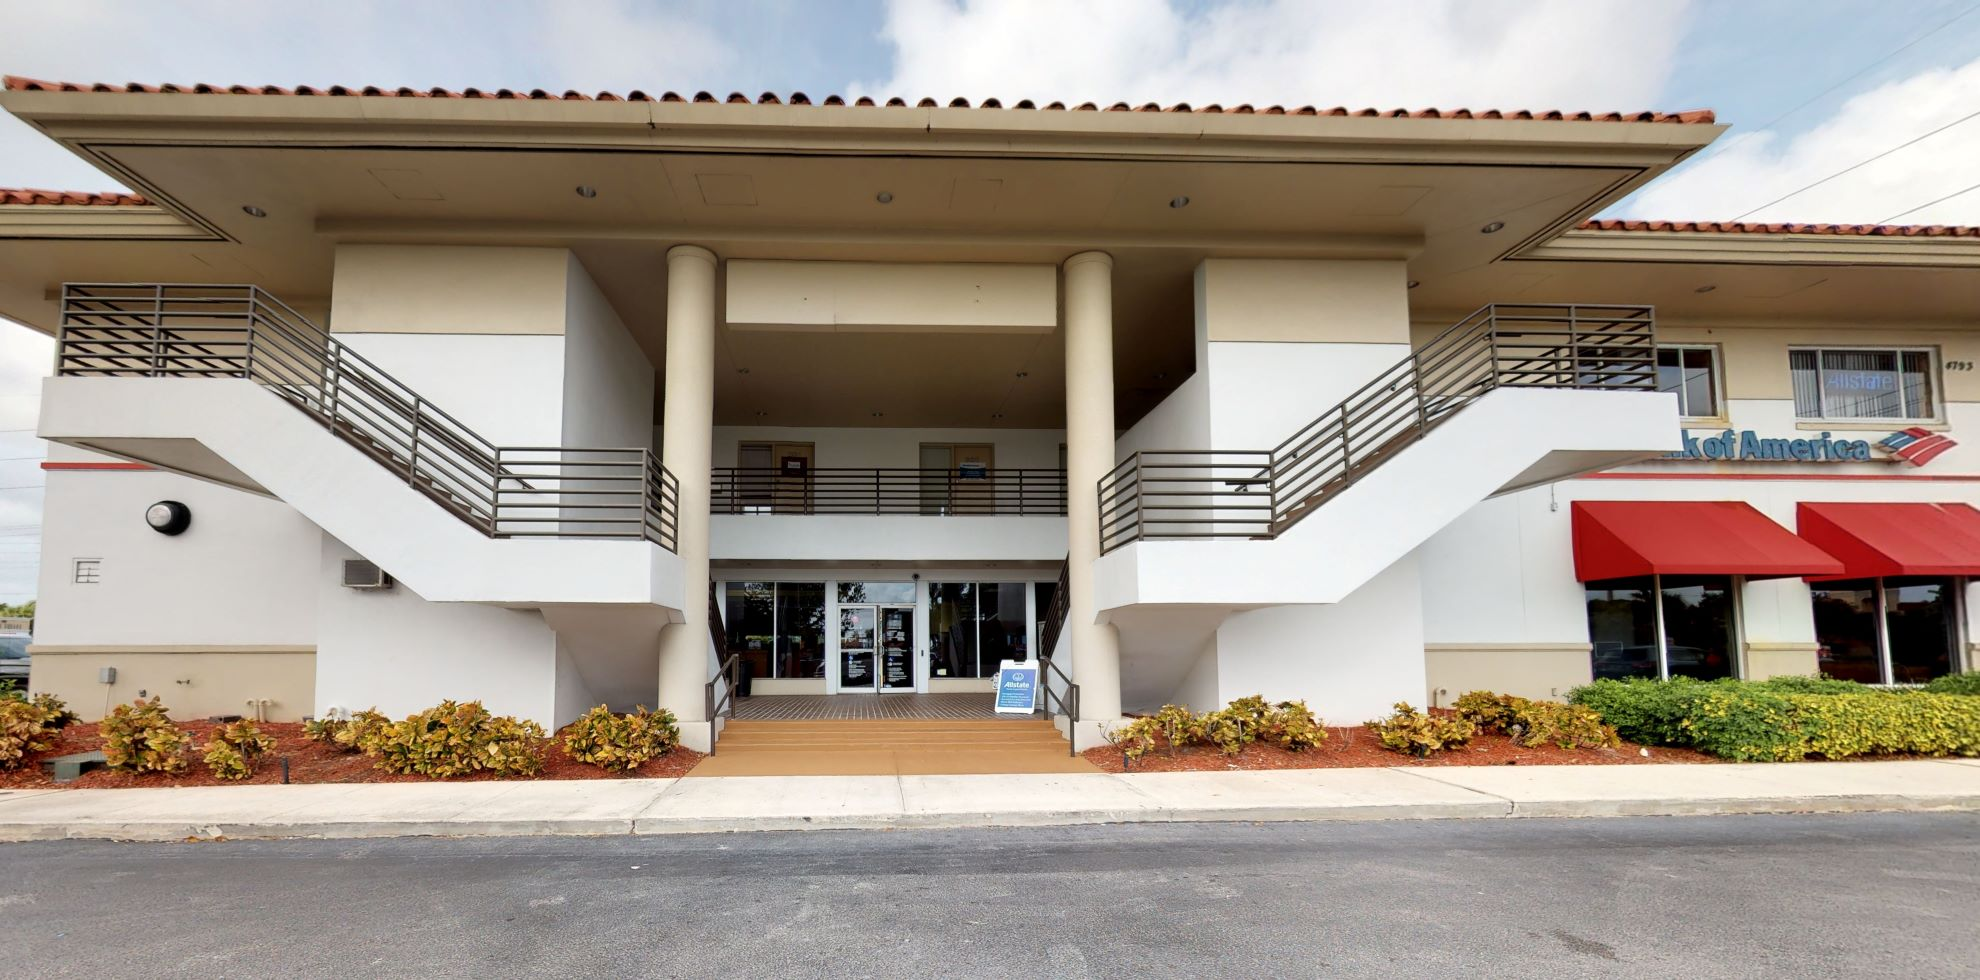 Bank of America financial center with drive-thru ATM and teller | 4793 N Congress Ave, Boynton Beach, FL 33426